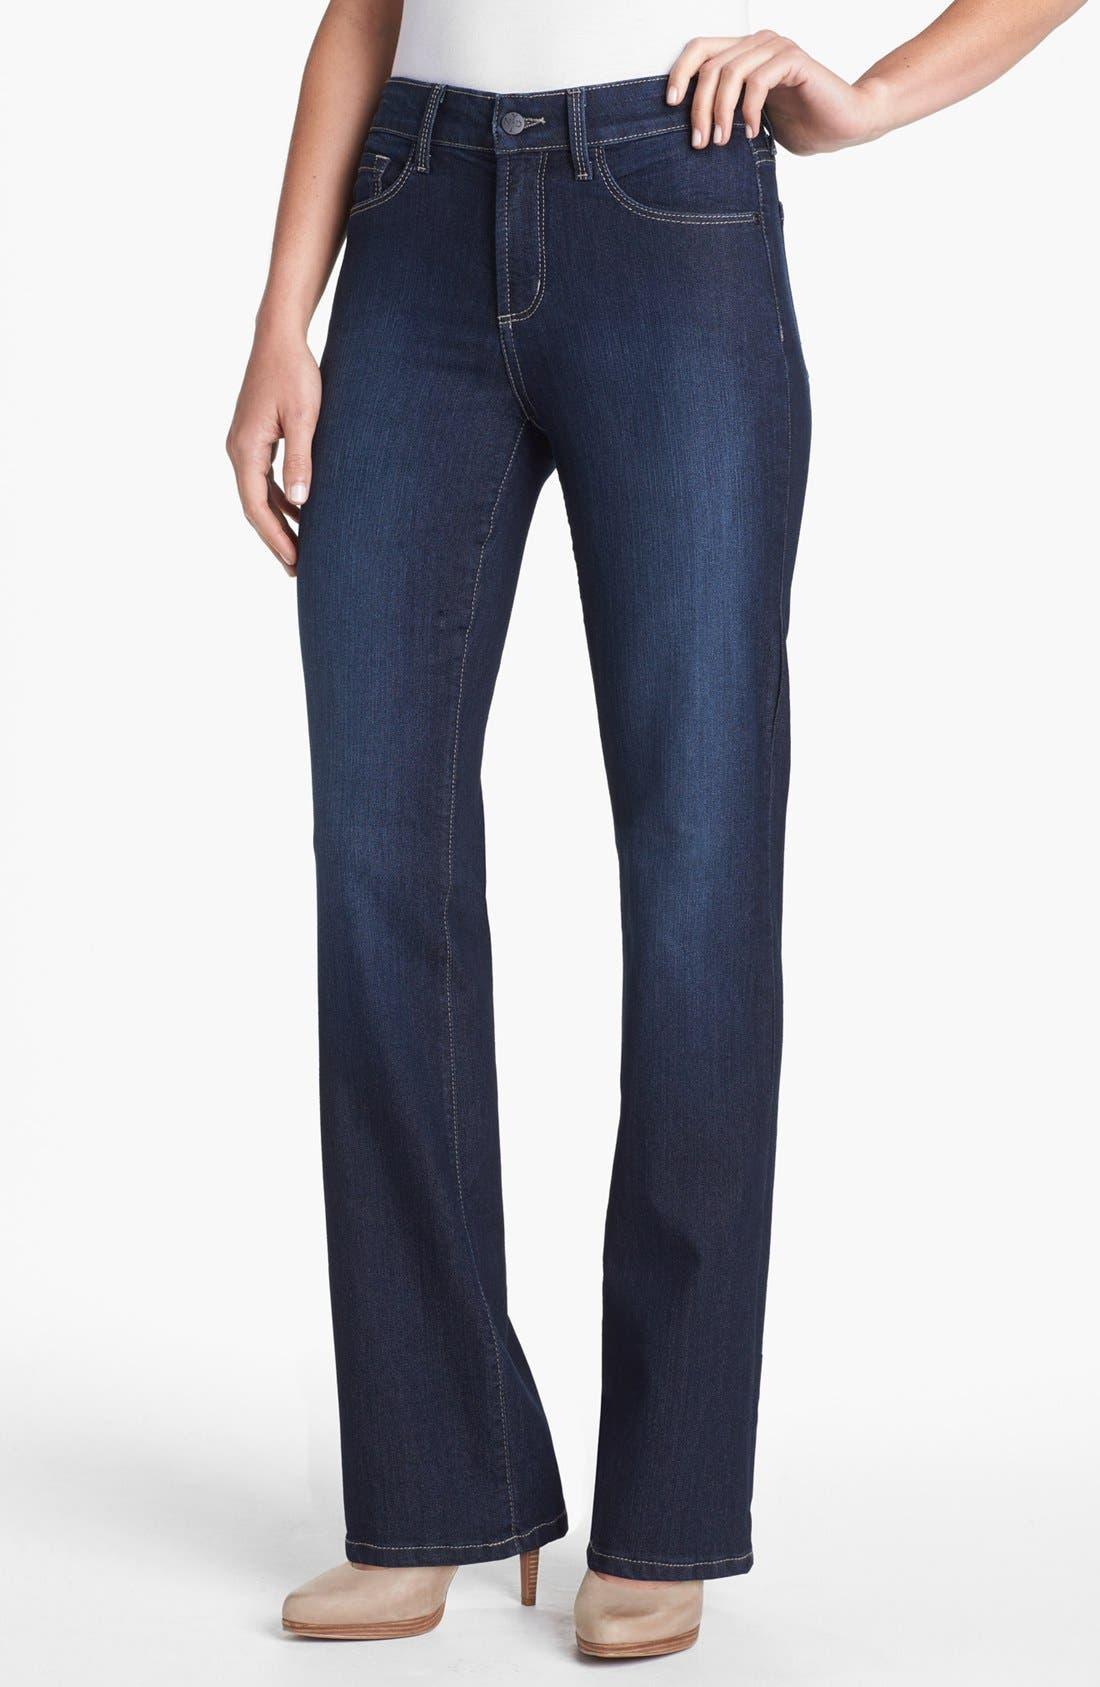 Main Image - NYDJ 'Barbara' Embellished Pocket Stretch Bootcut Jeans (Hollywood) (Regular & Petite)